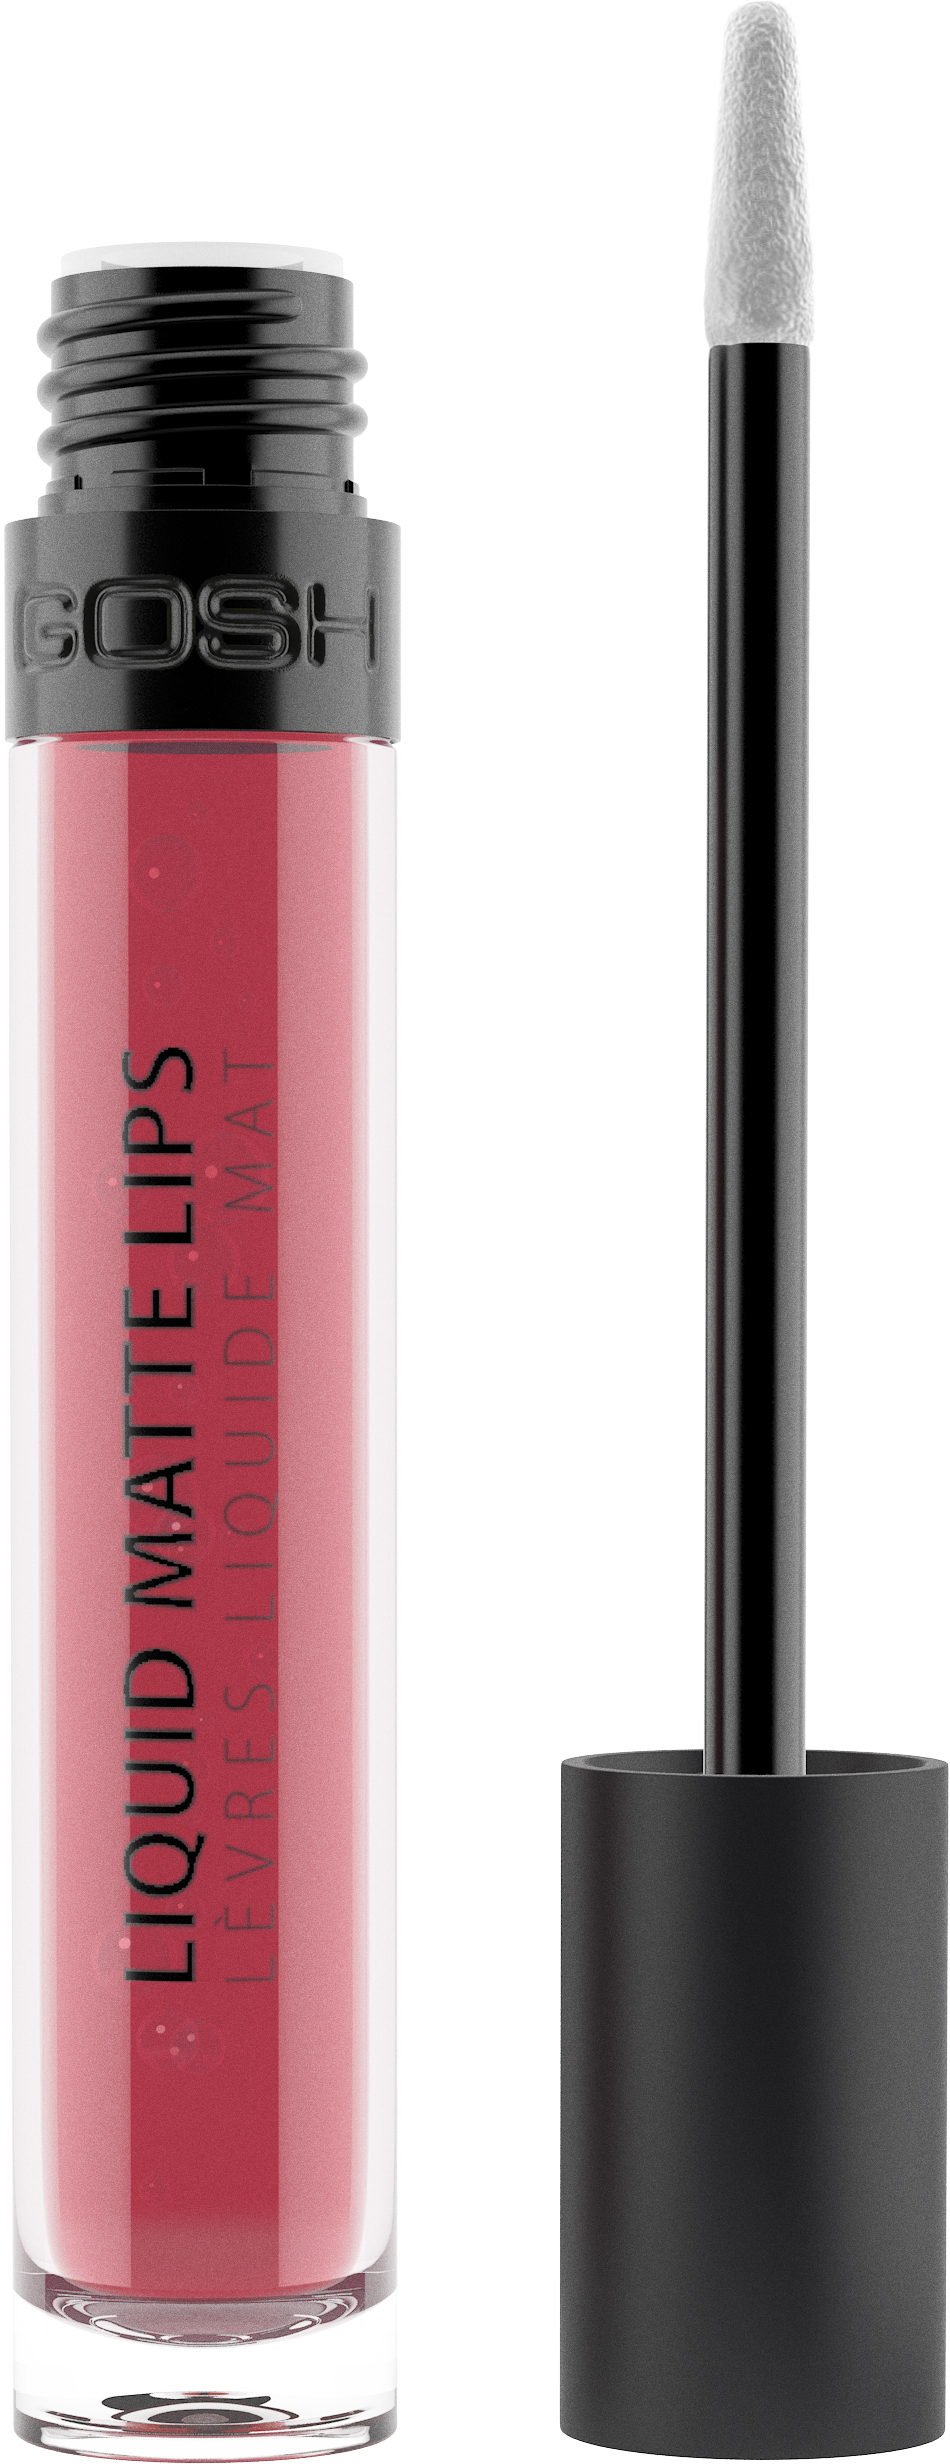 Liquid Matte Lips N04 open.jpg